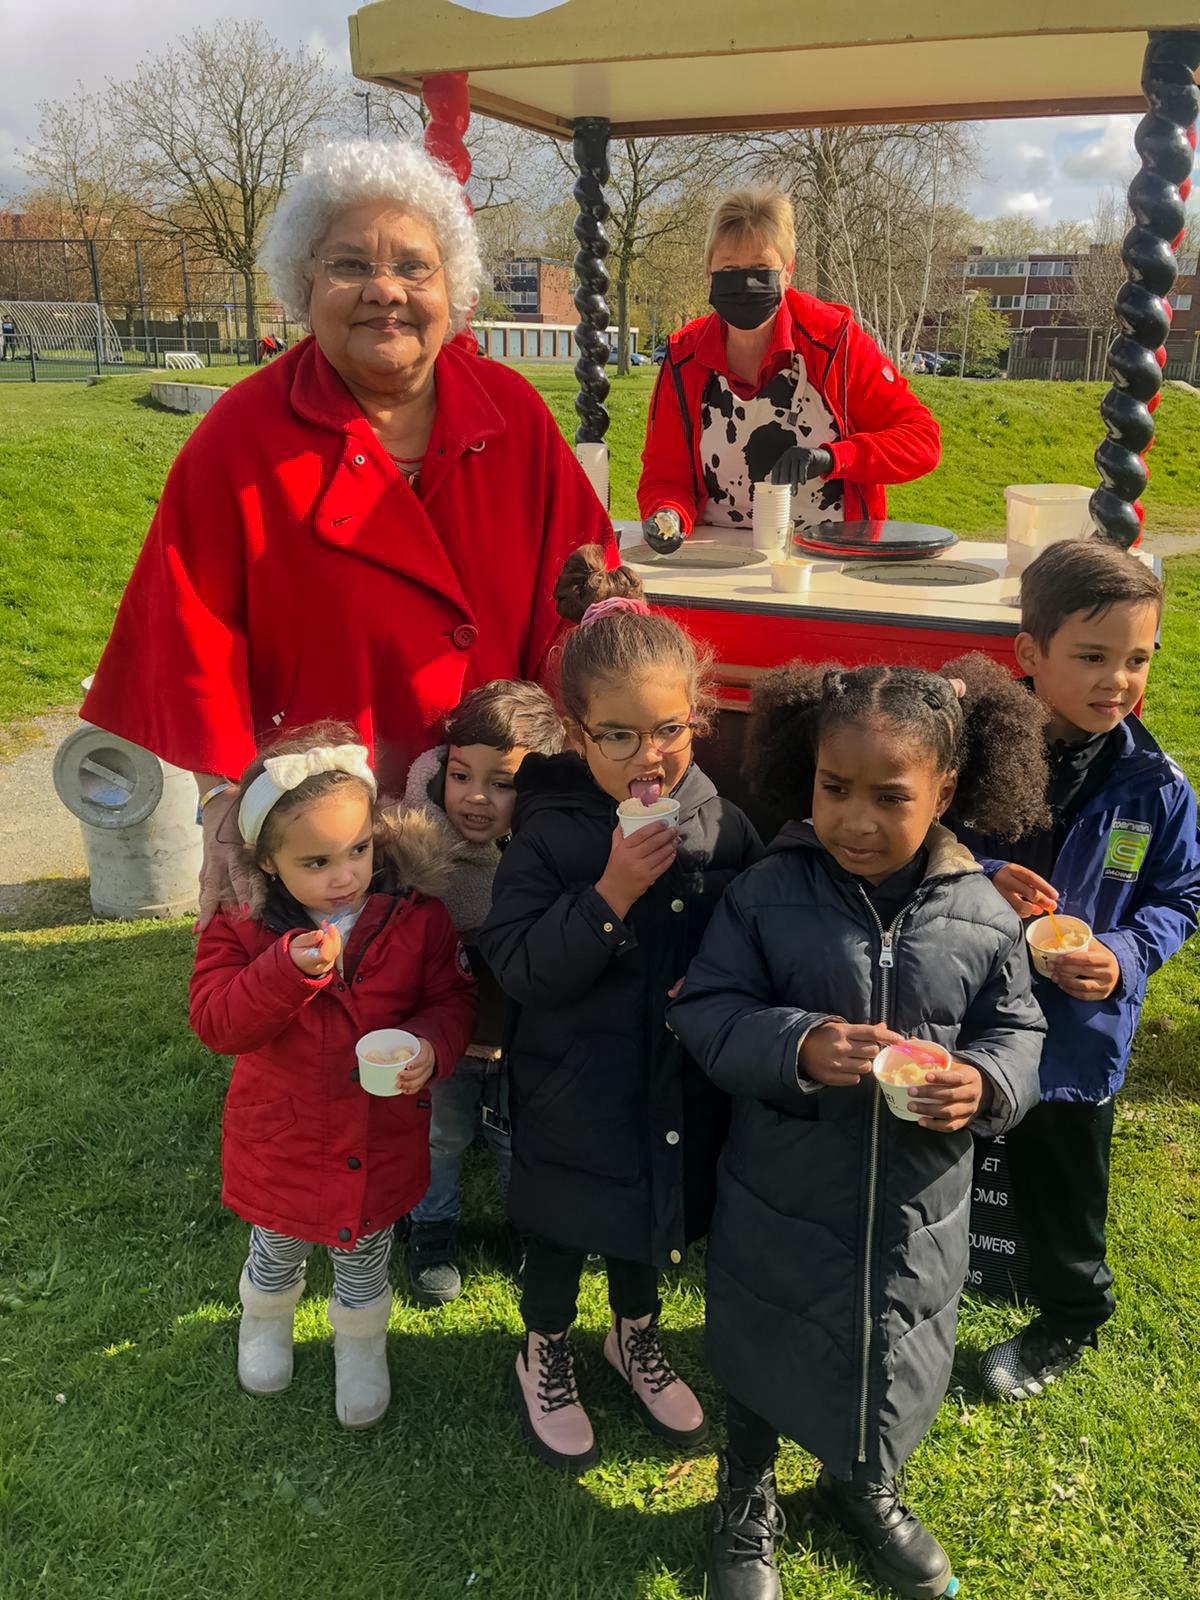 Foto Officiele onthulling MILA mila met kinderen